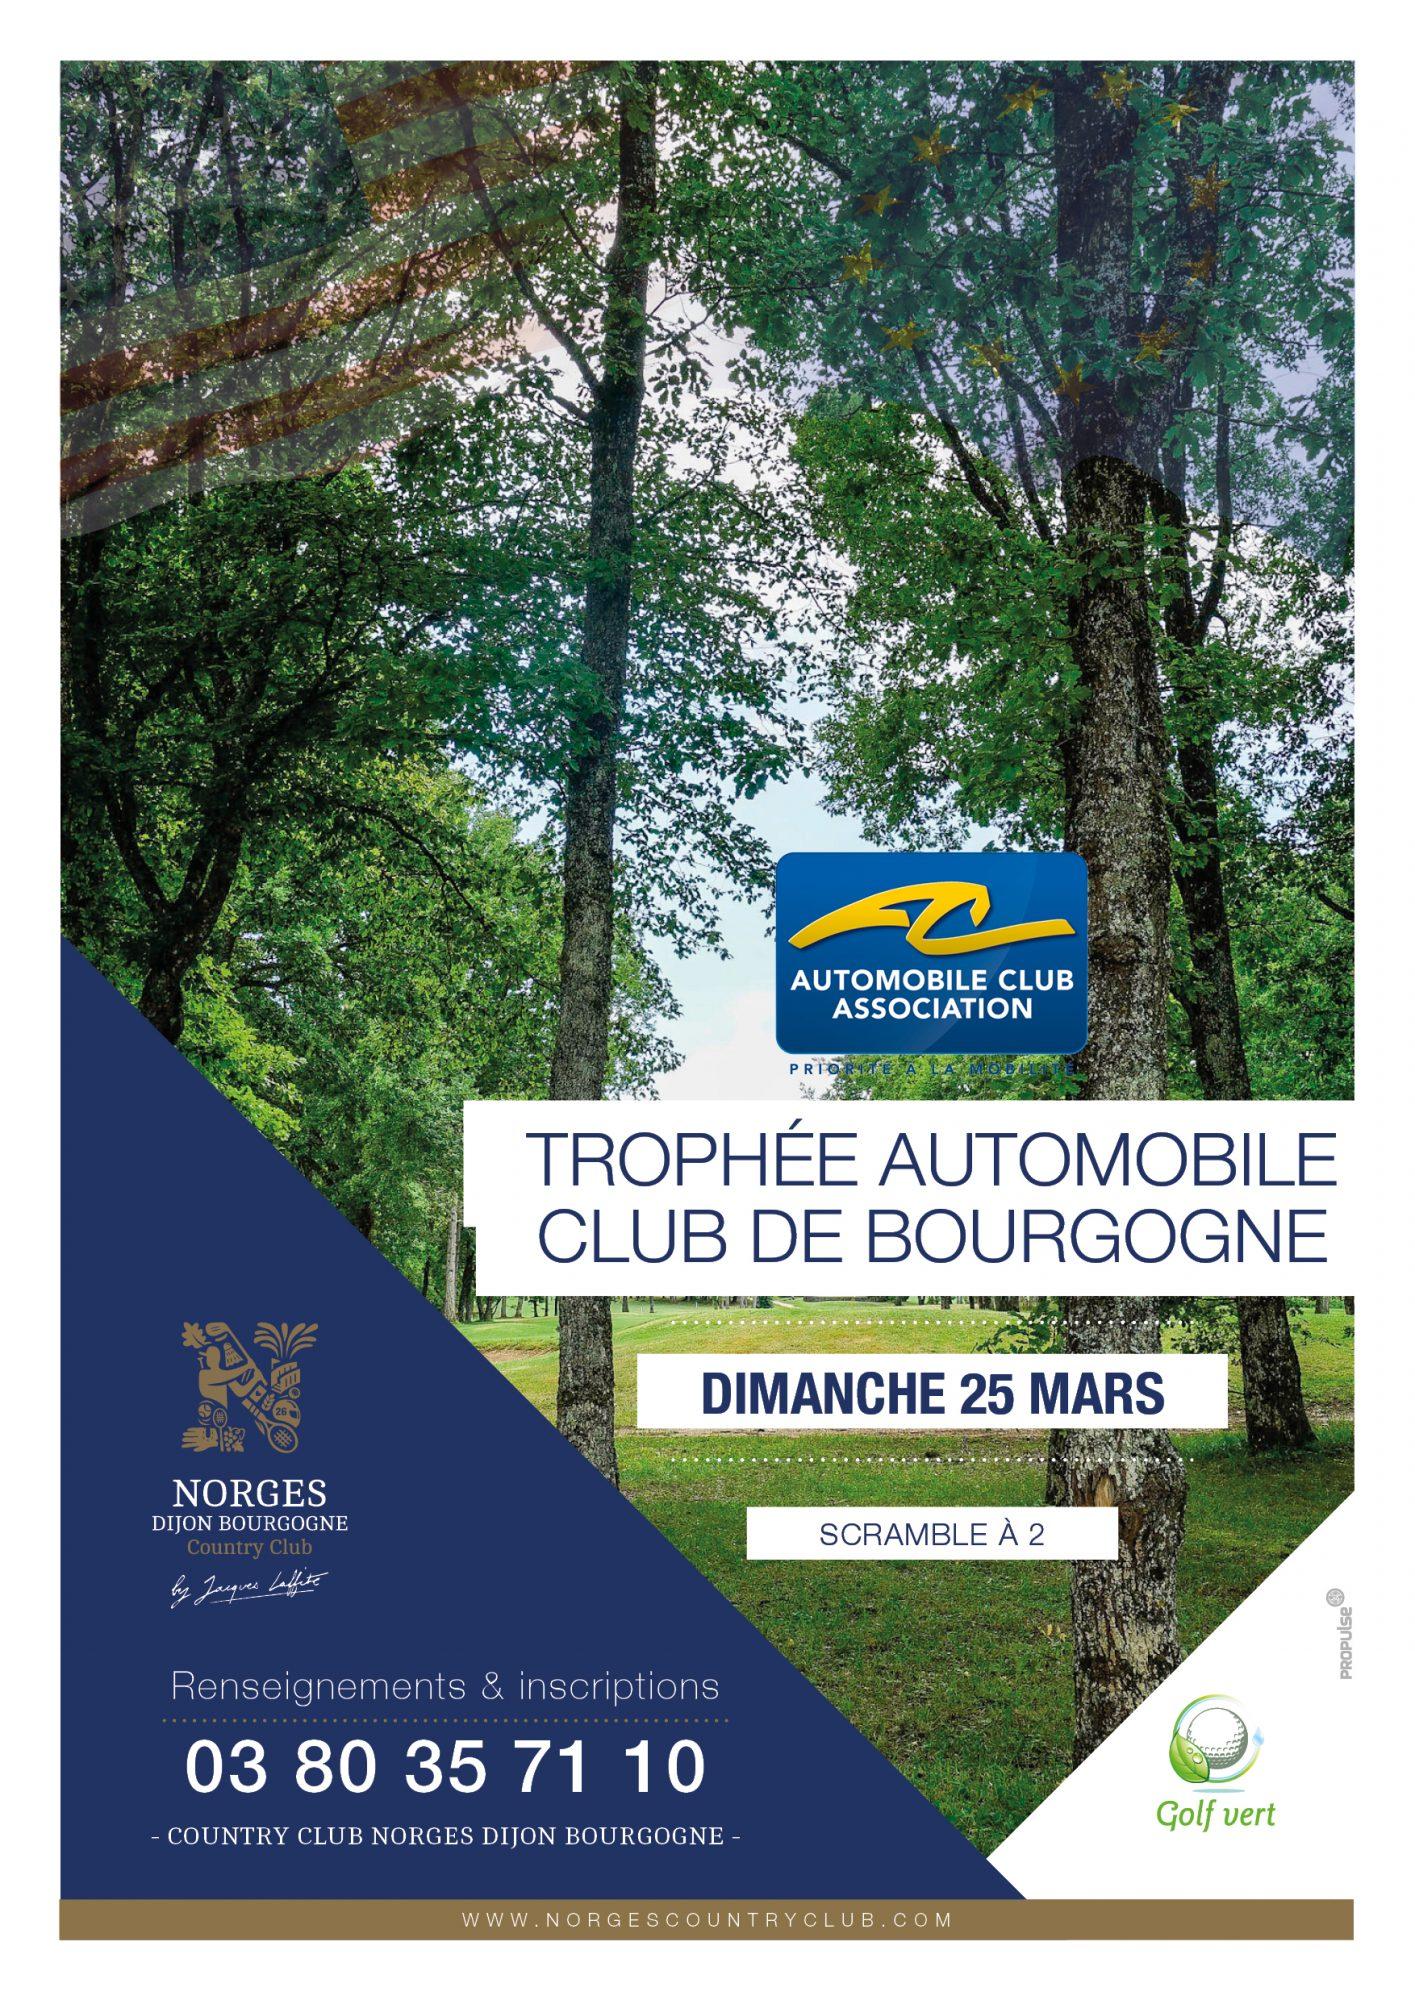 Trophée Automobile Club de Bourgogne